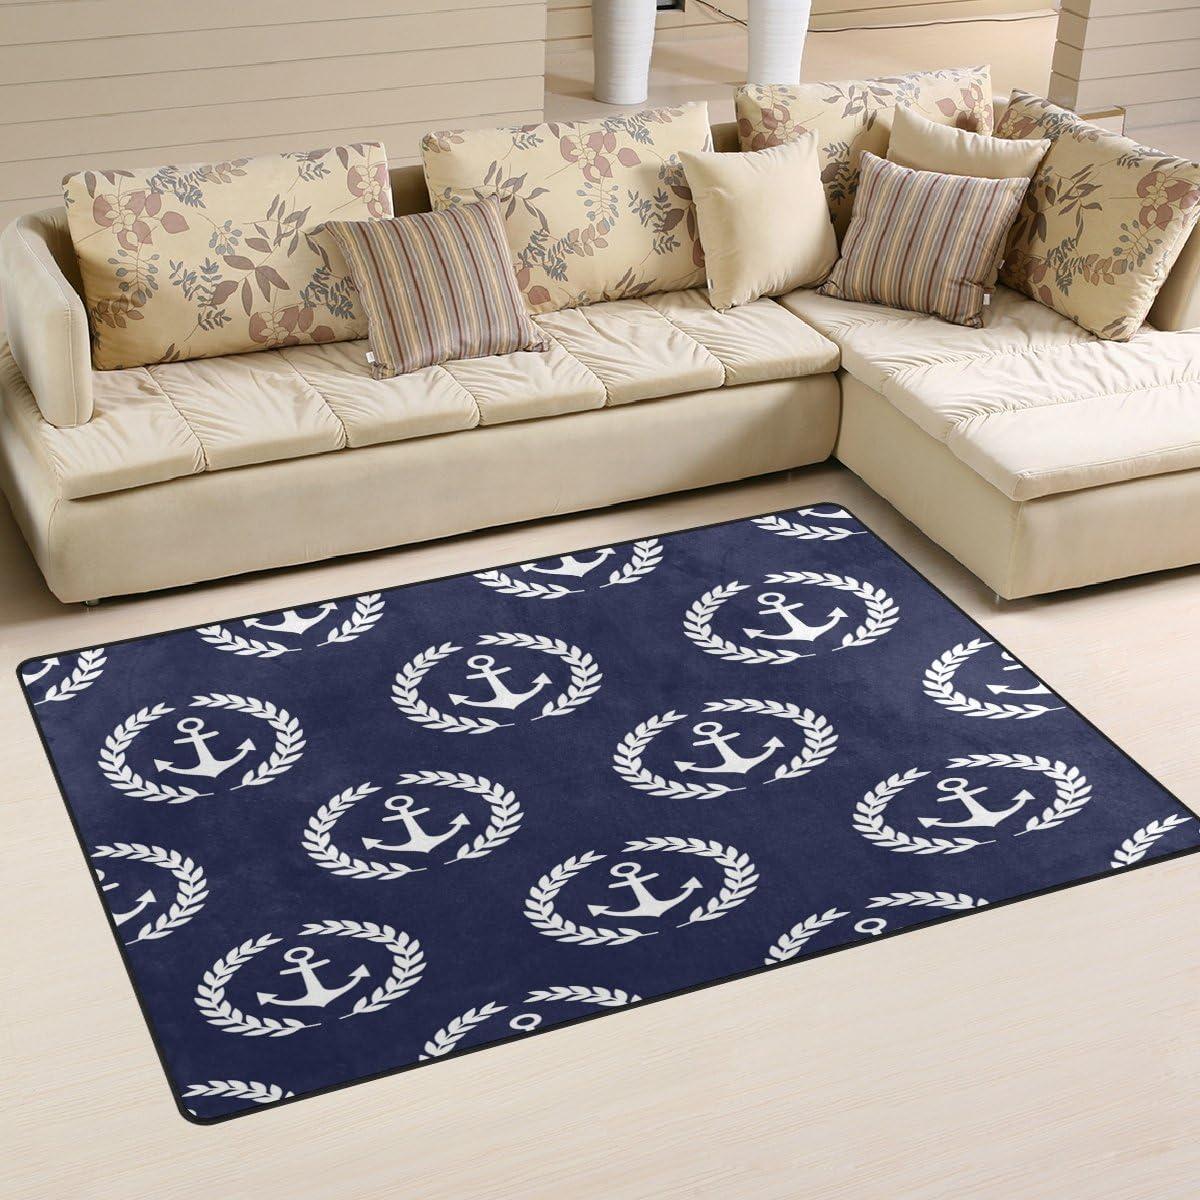 WOZO Navy Anchor Blue Area Rug Mat Floor Doormats Rugs Non-Slip Challenge the lowest Max 88% OFF price of Japan